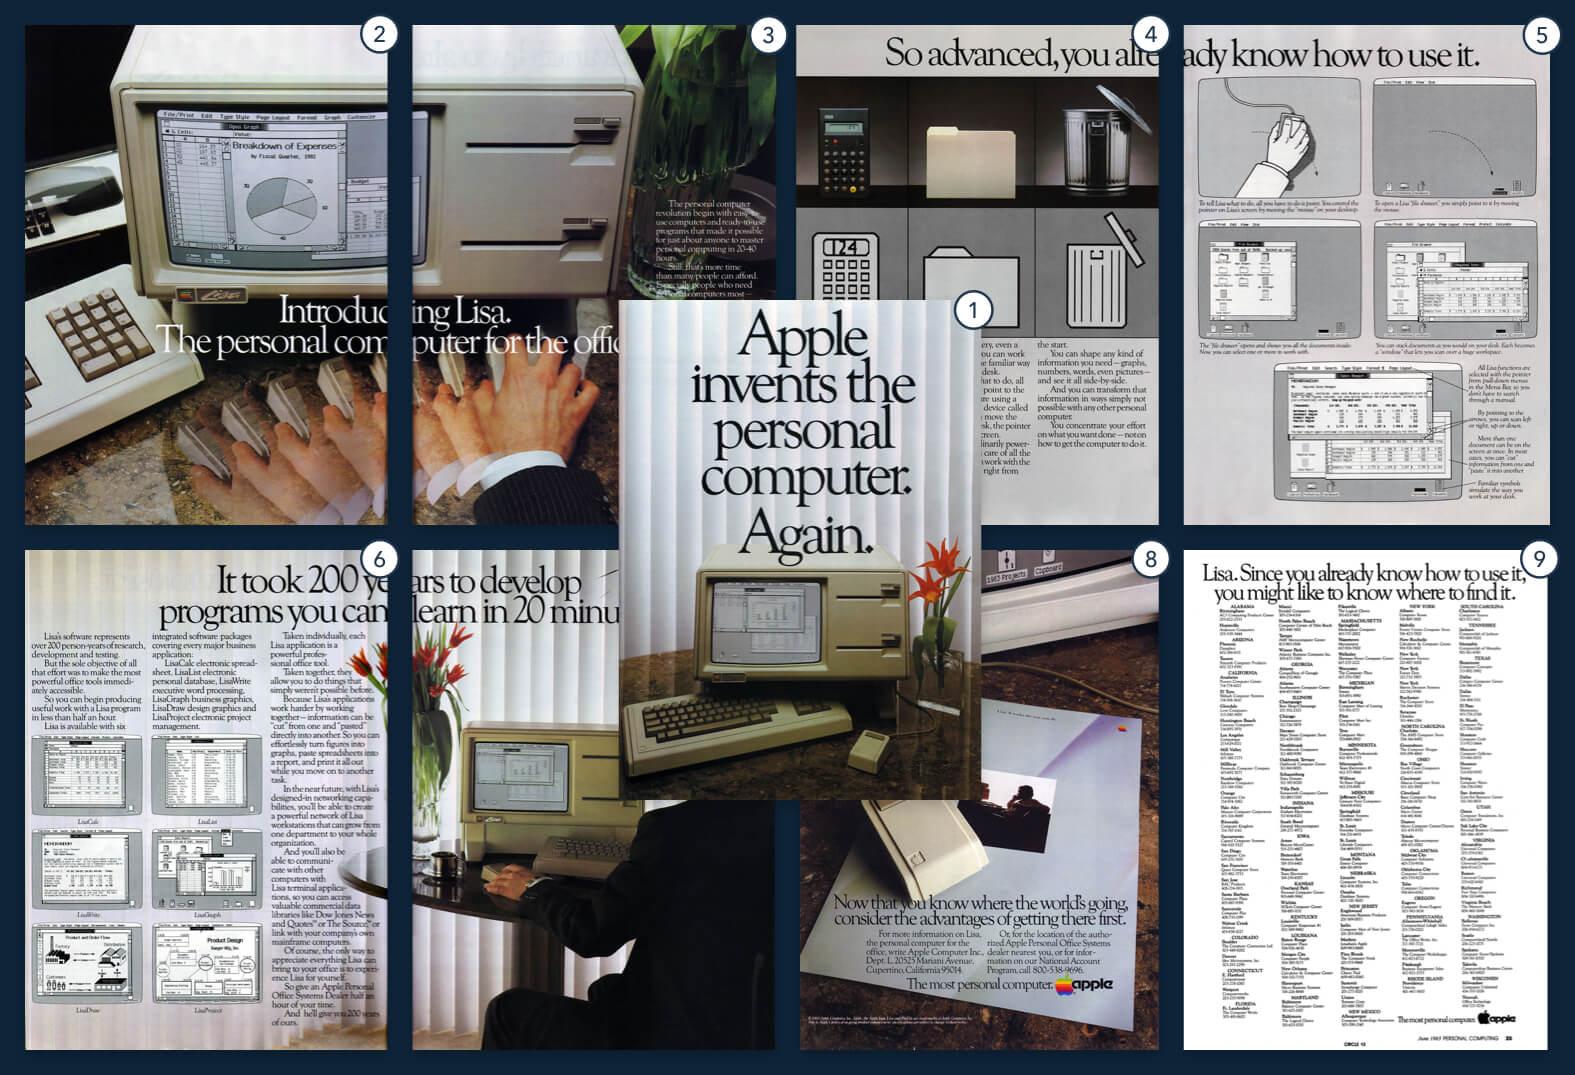 Apple 1983 New York Times ad